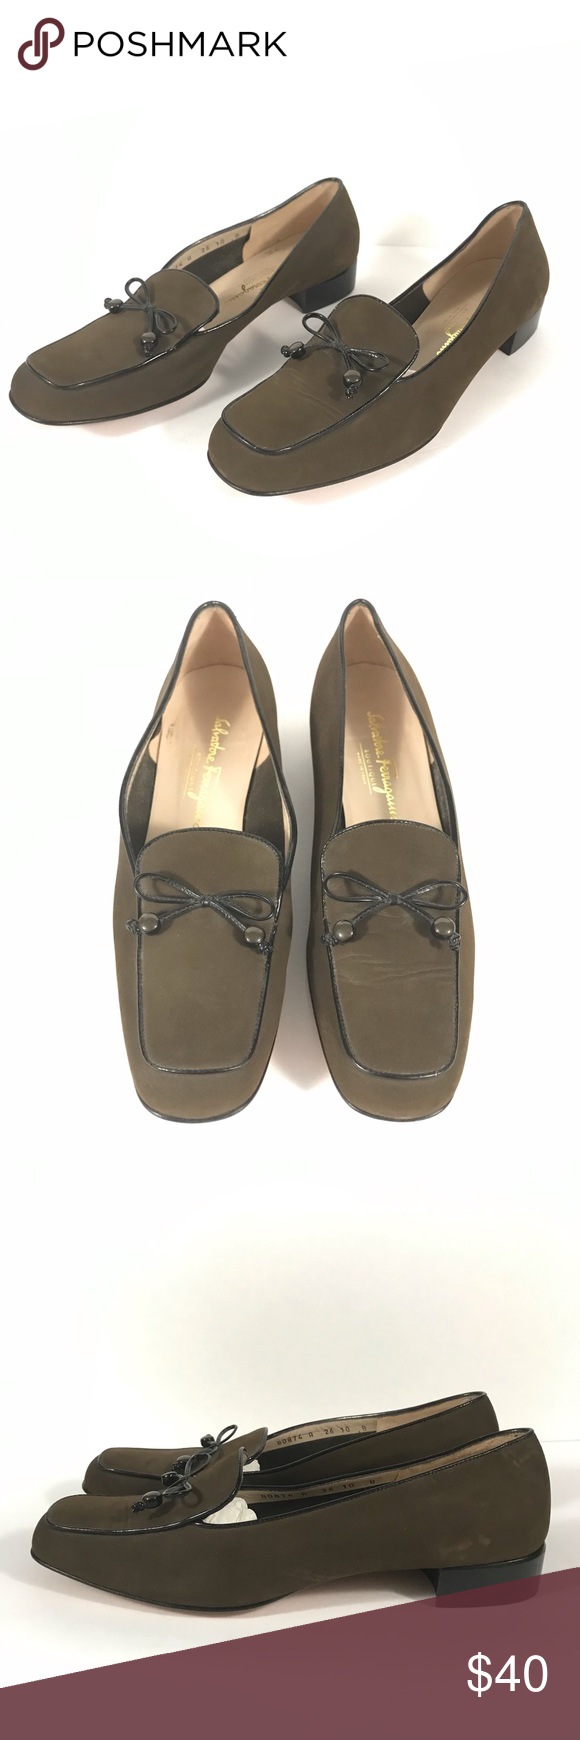 Salvatore Ferragamo Boutique Suede Loafers Suede Shoes Women Brown Suede Loafers Suede Loafers